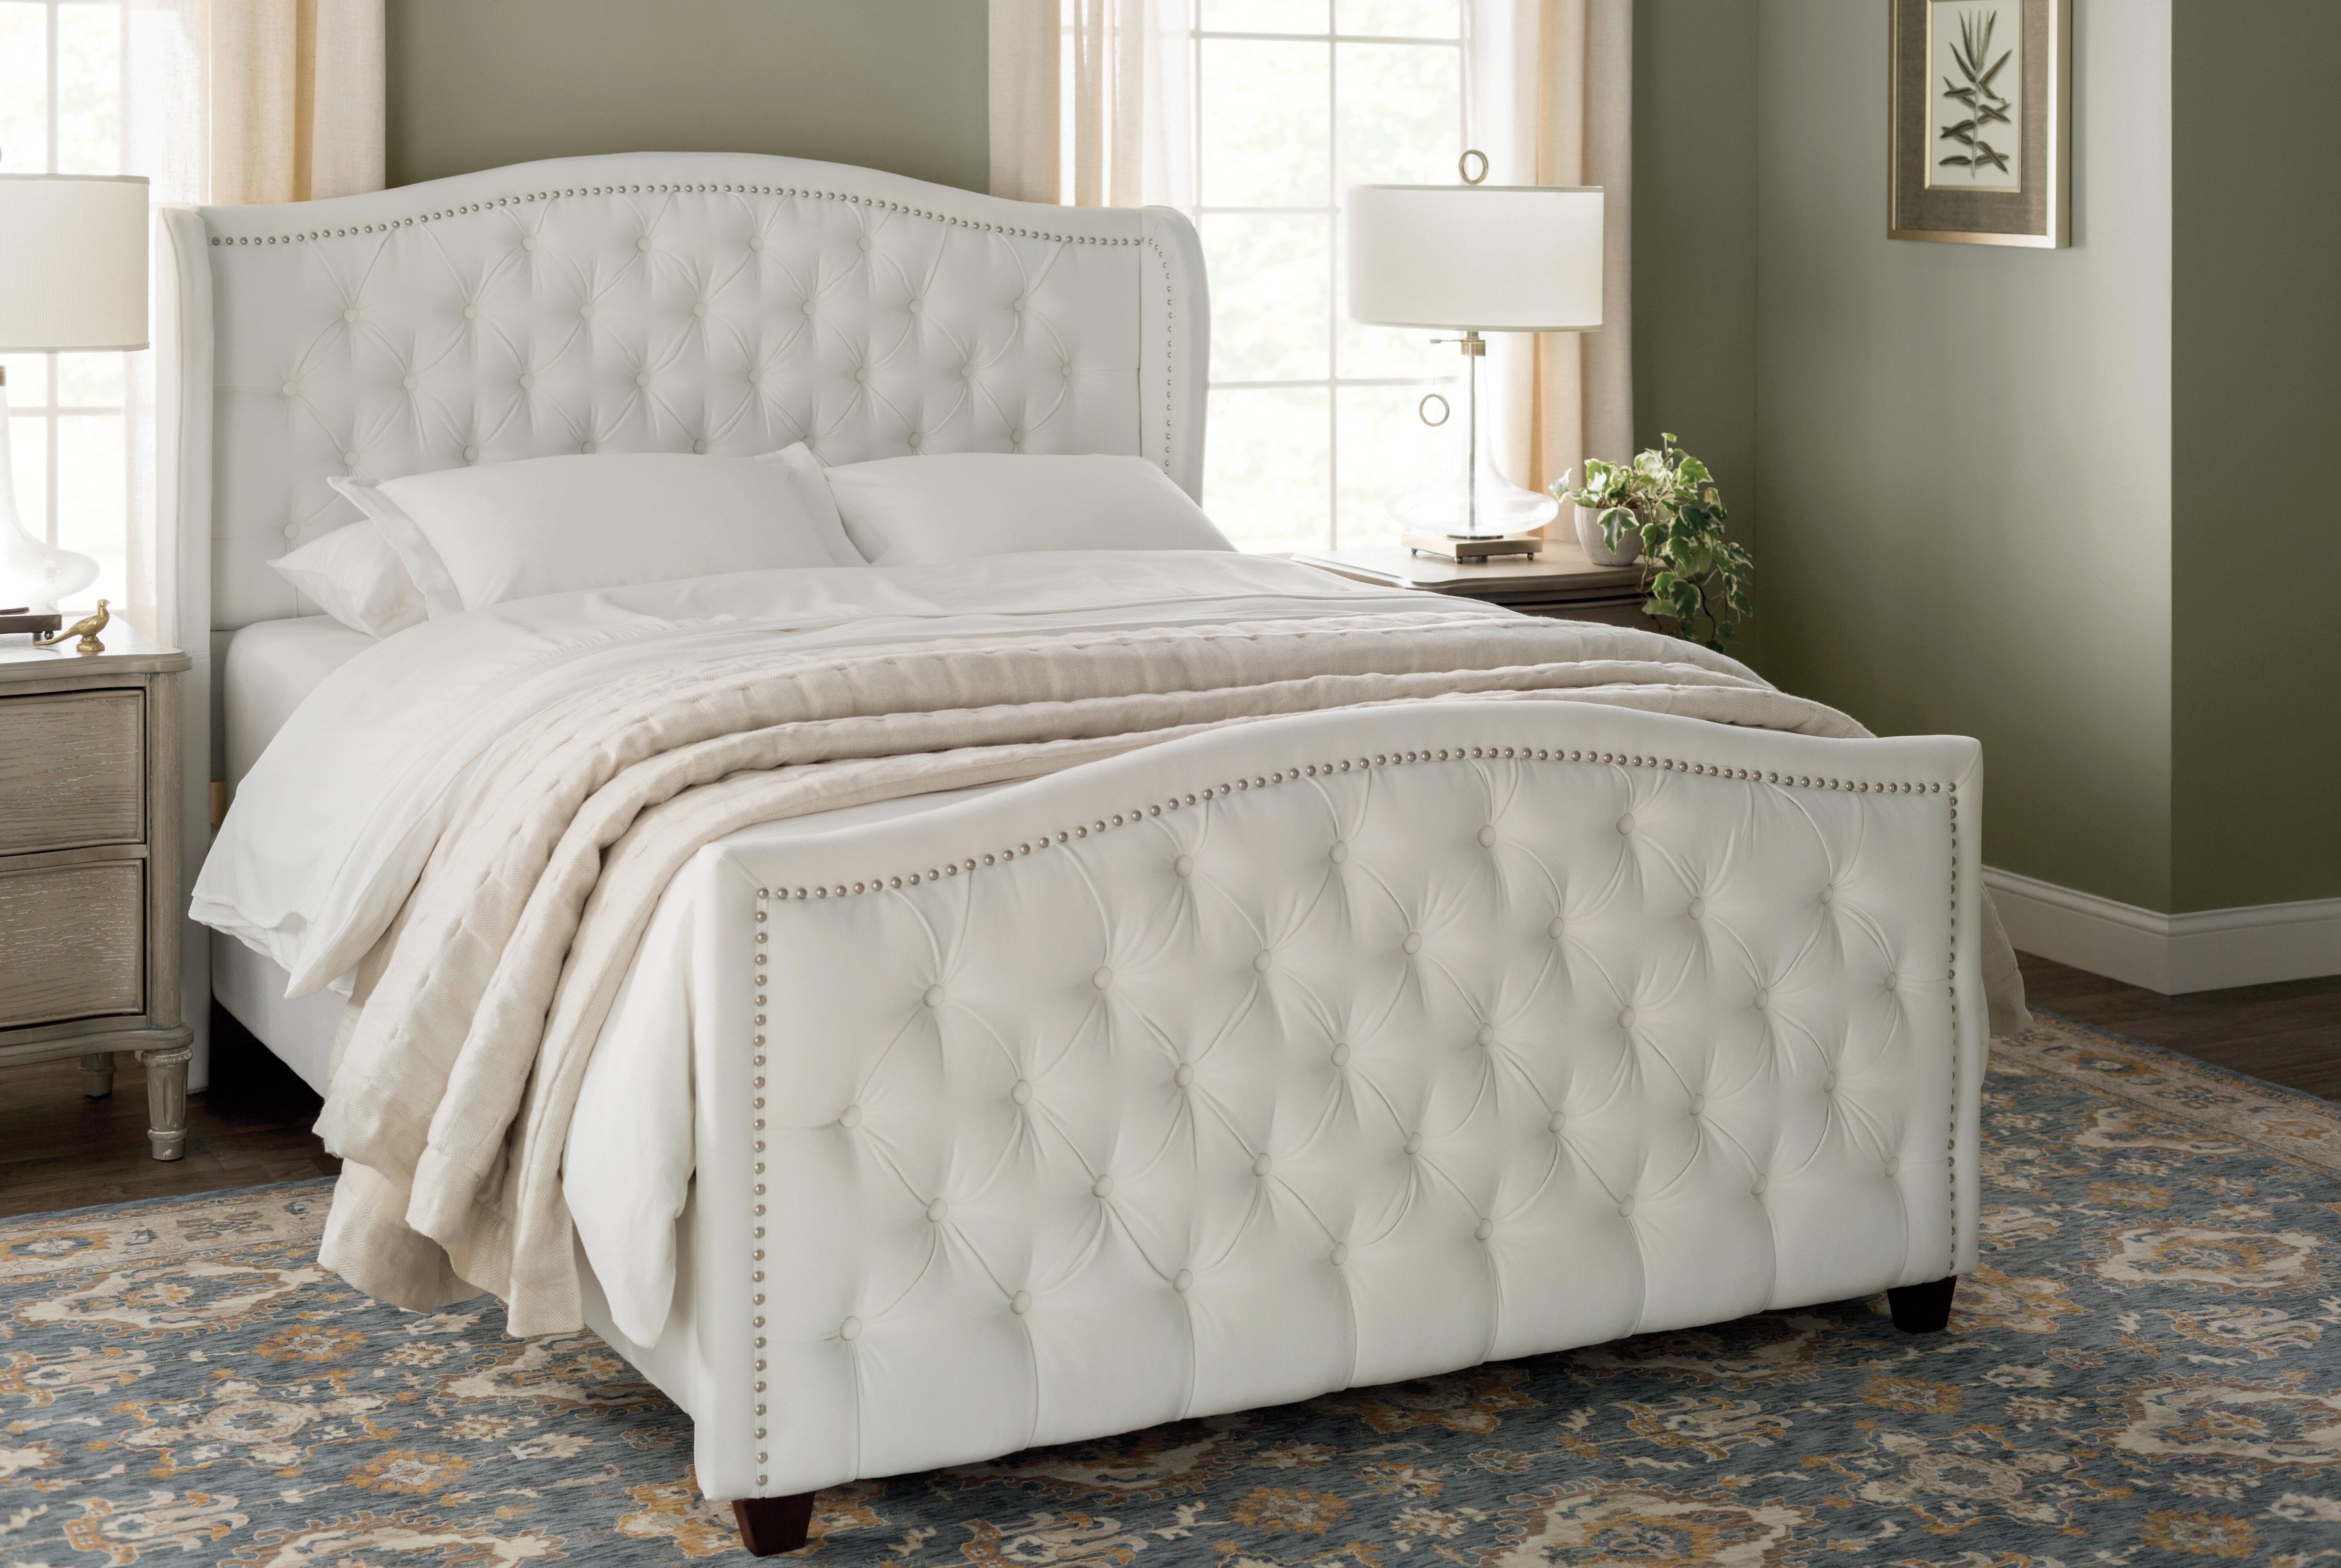 71502c41e5b8 Willa Arlo Interiors Marlon Upholstered Panel Bed   Reviews